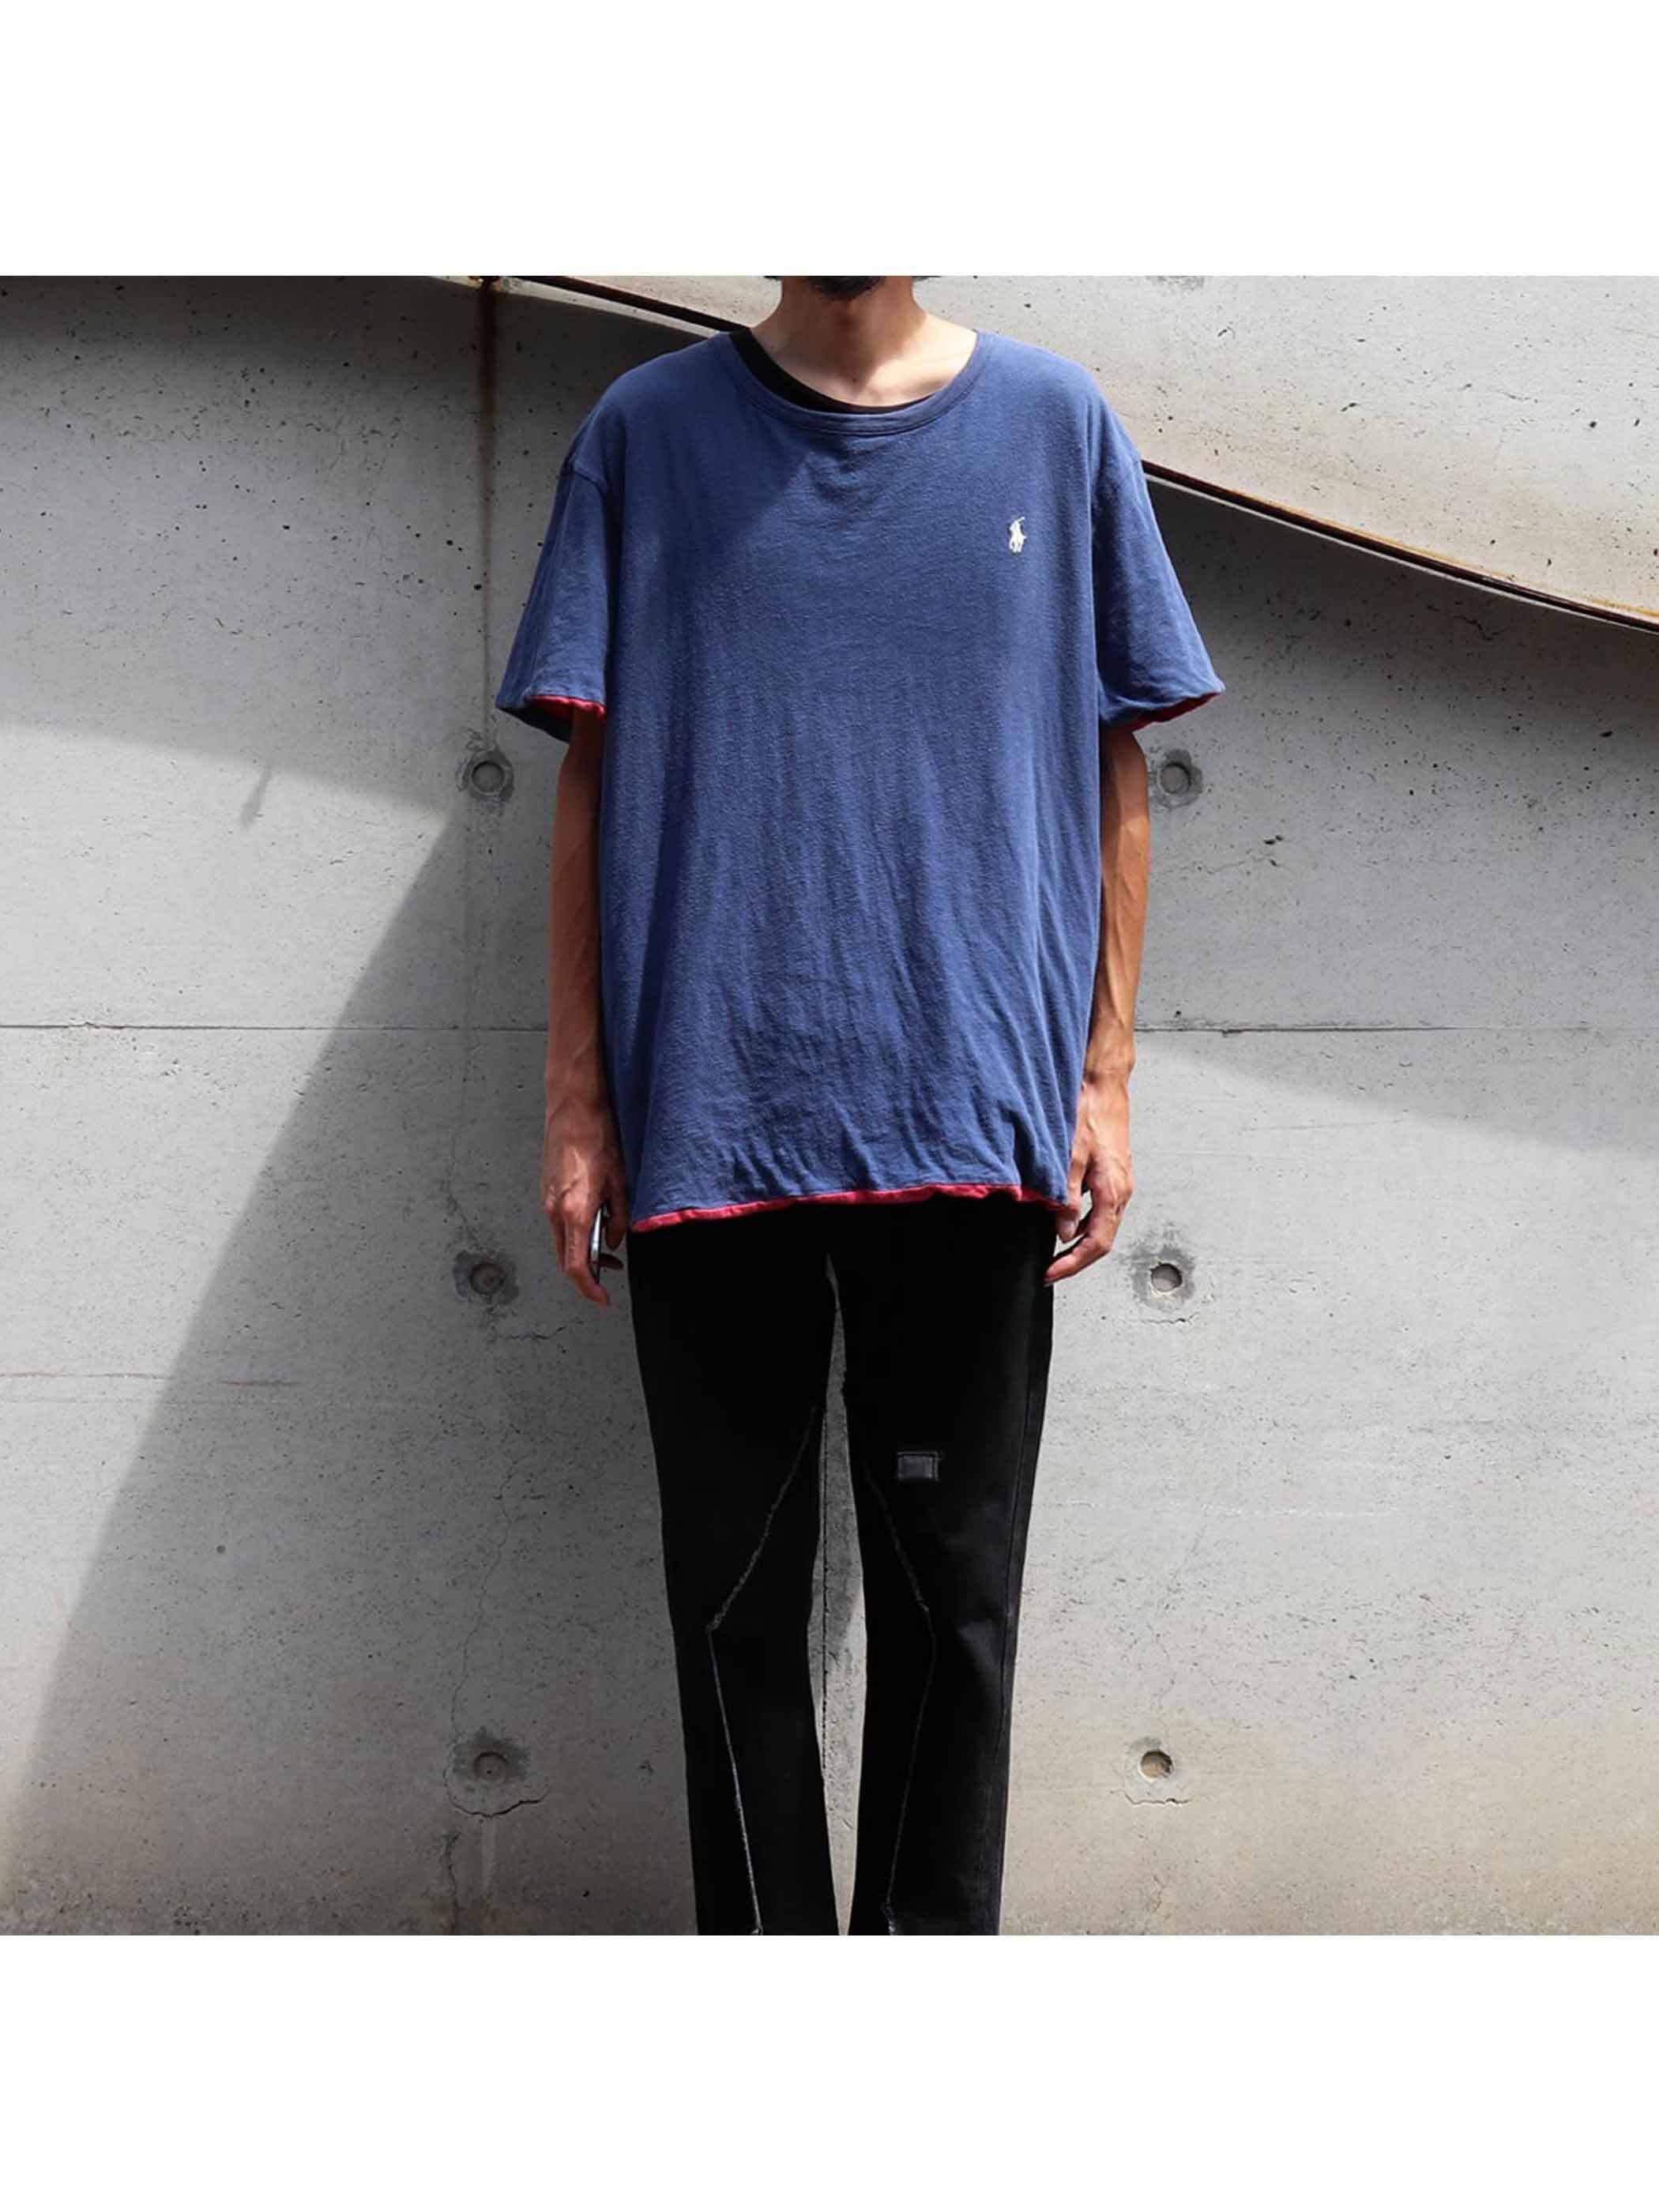 00's~ POLO RALPH LAUREN リバーシブルTシャツ [About XL]